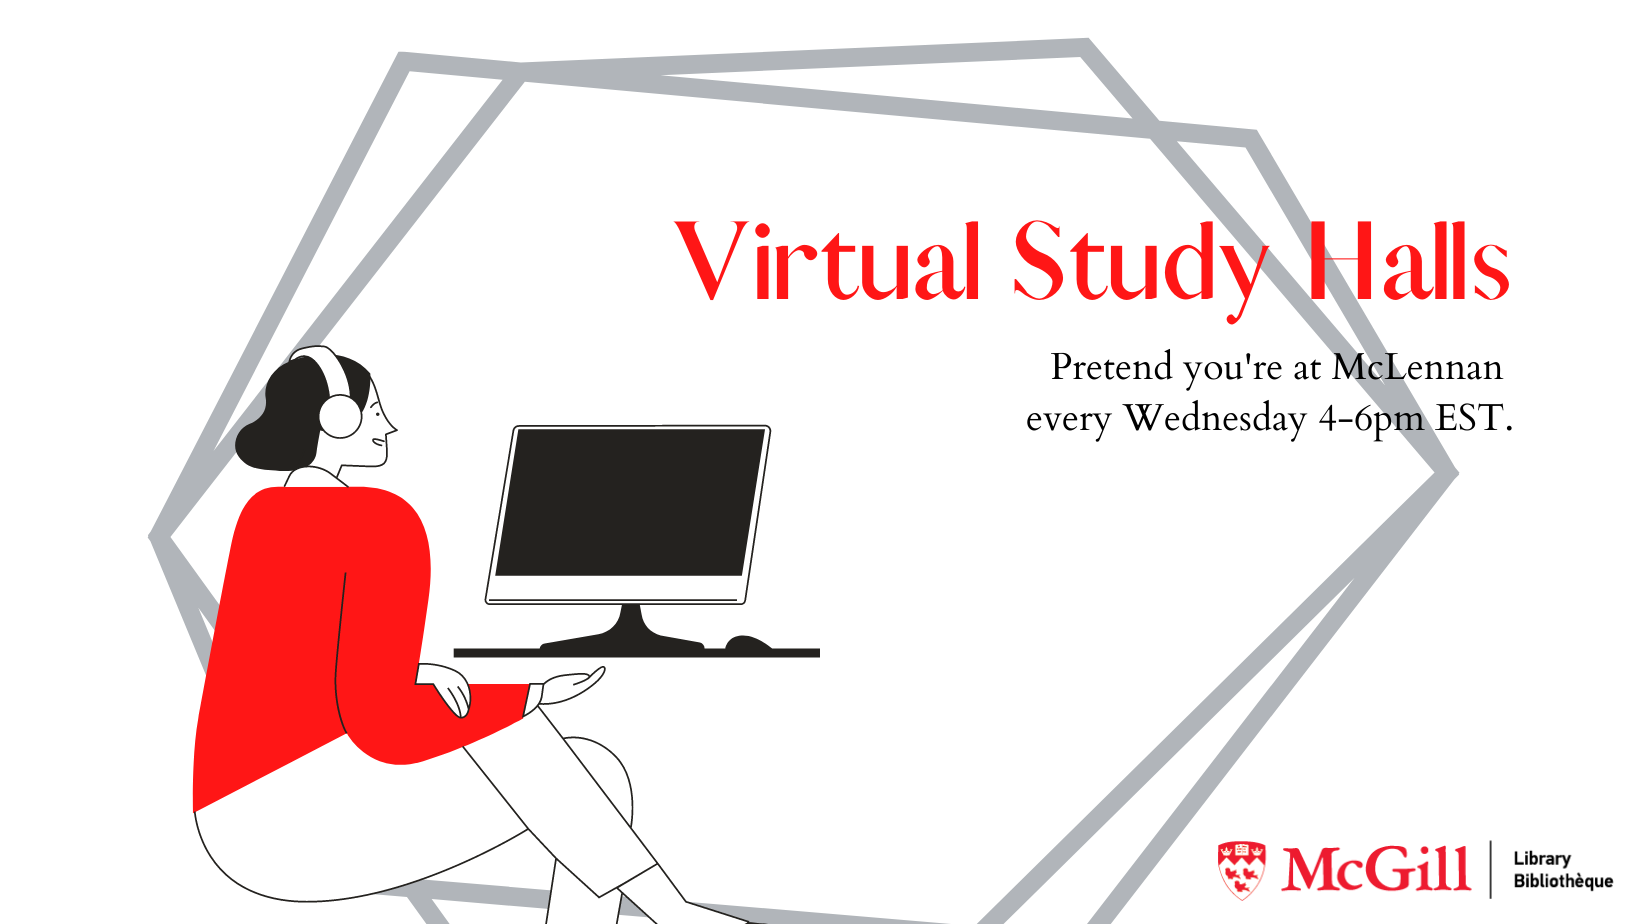 virtual study hall every wednesday 4-6pm EST